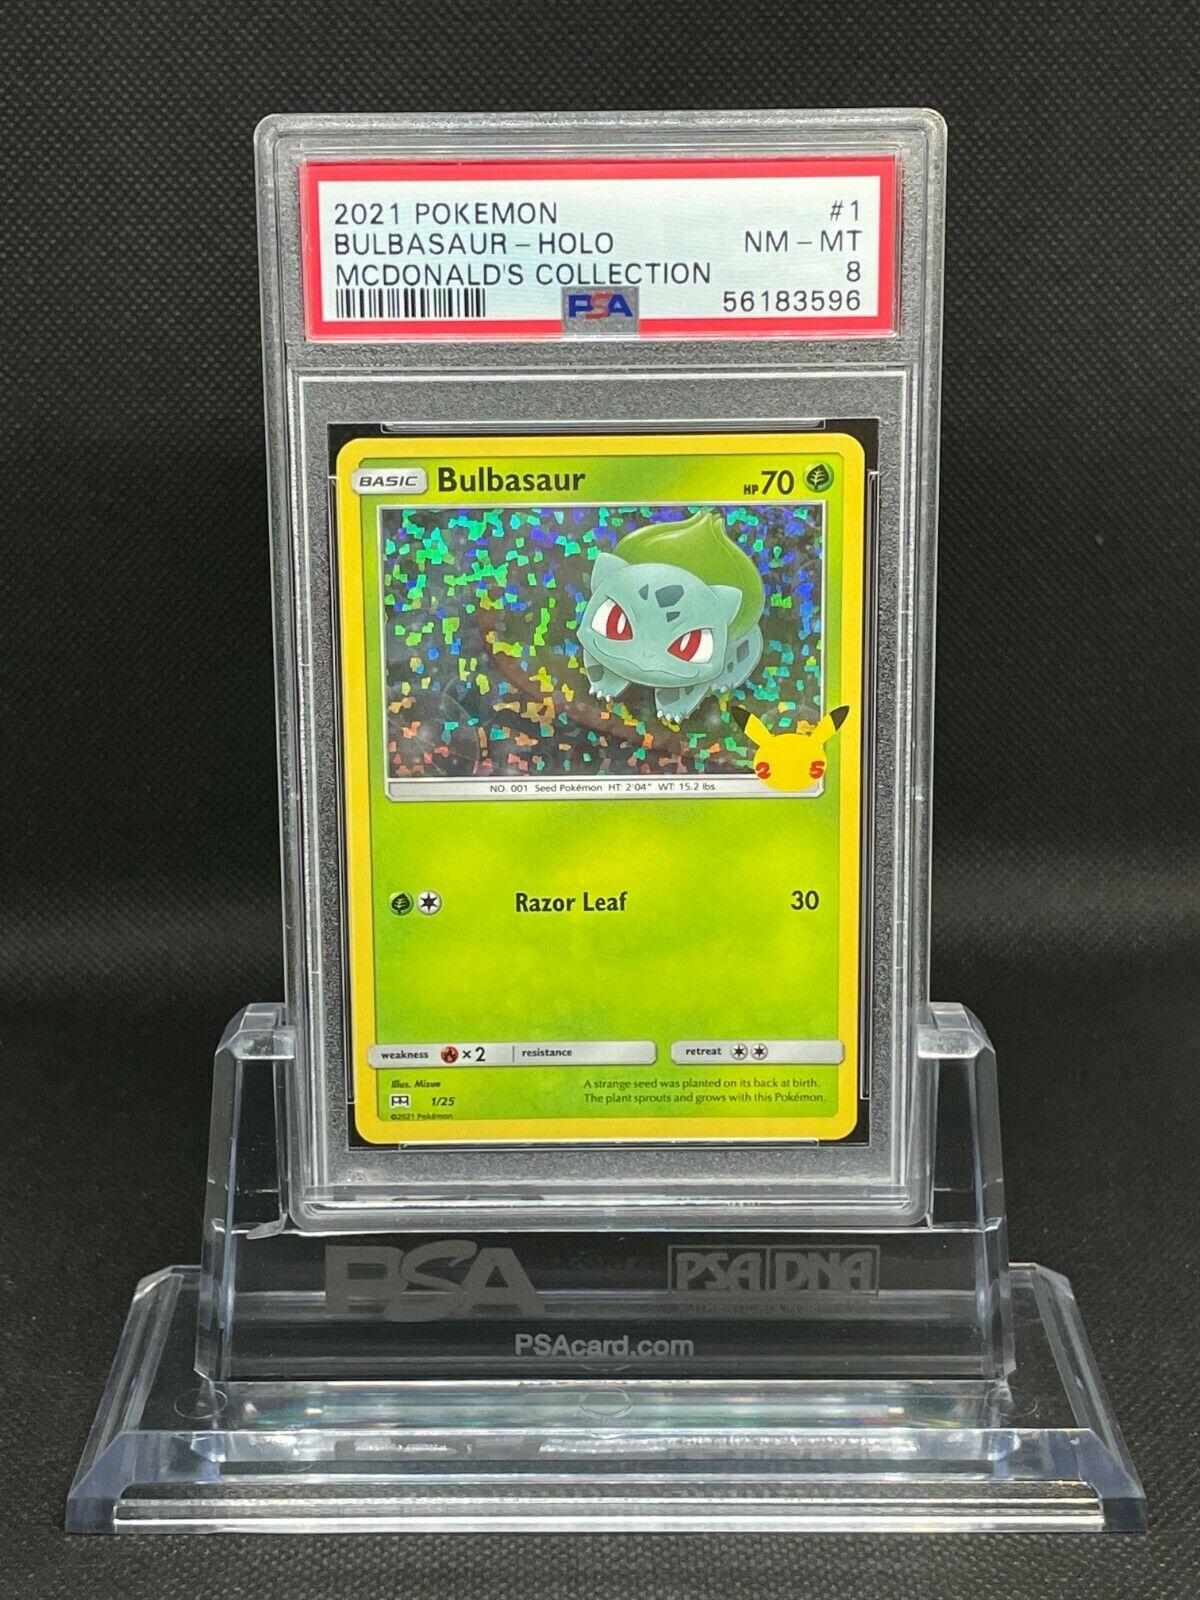 Pokemon - 2021 Mcdonald's Collection - Bulbasaur 1/25 - Holo - PSA 8 Near Mint